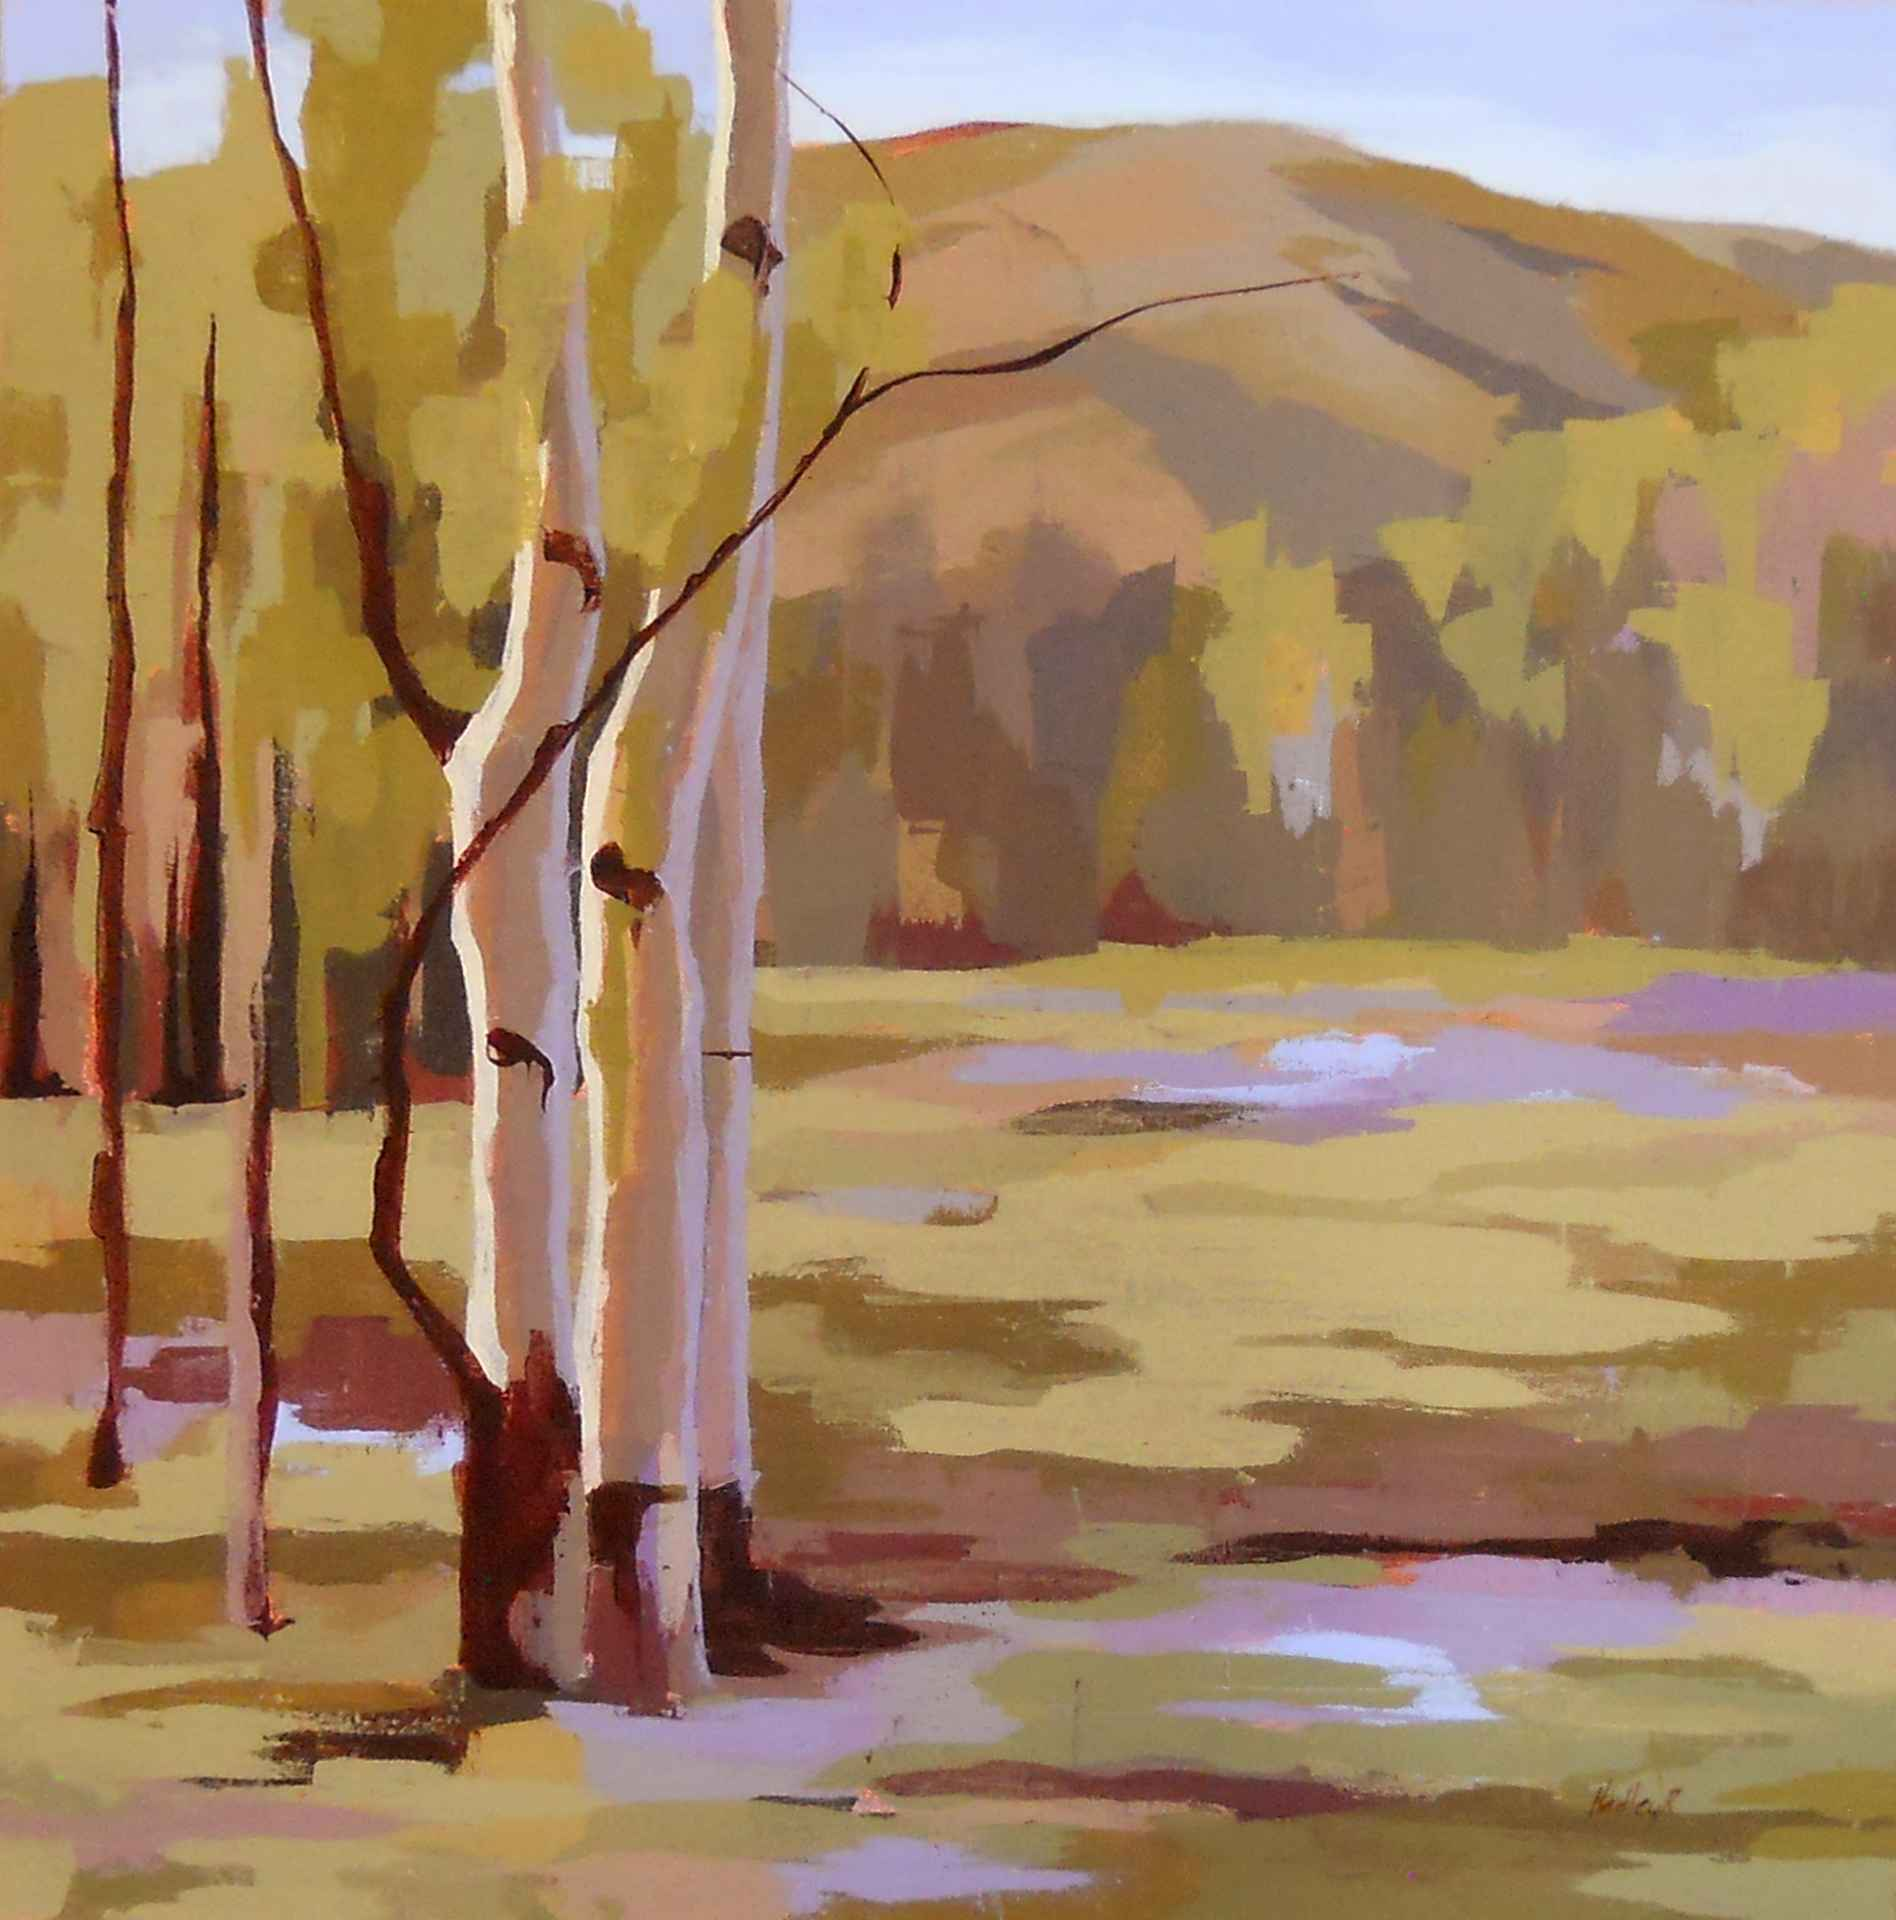 Waning Summer Light by  Hadley Rampton - Masterpiece Online